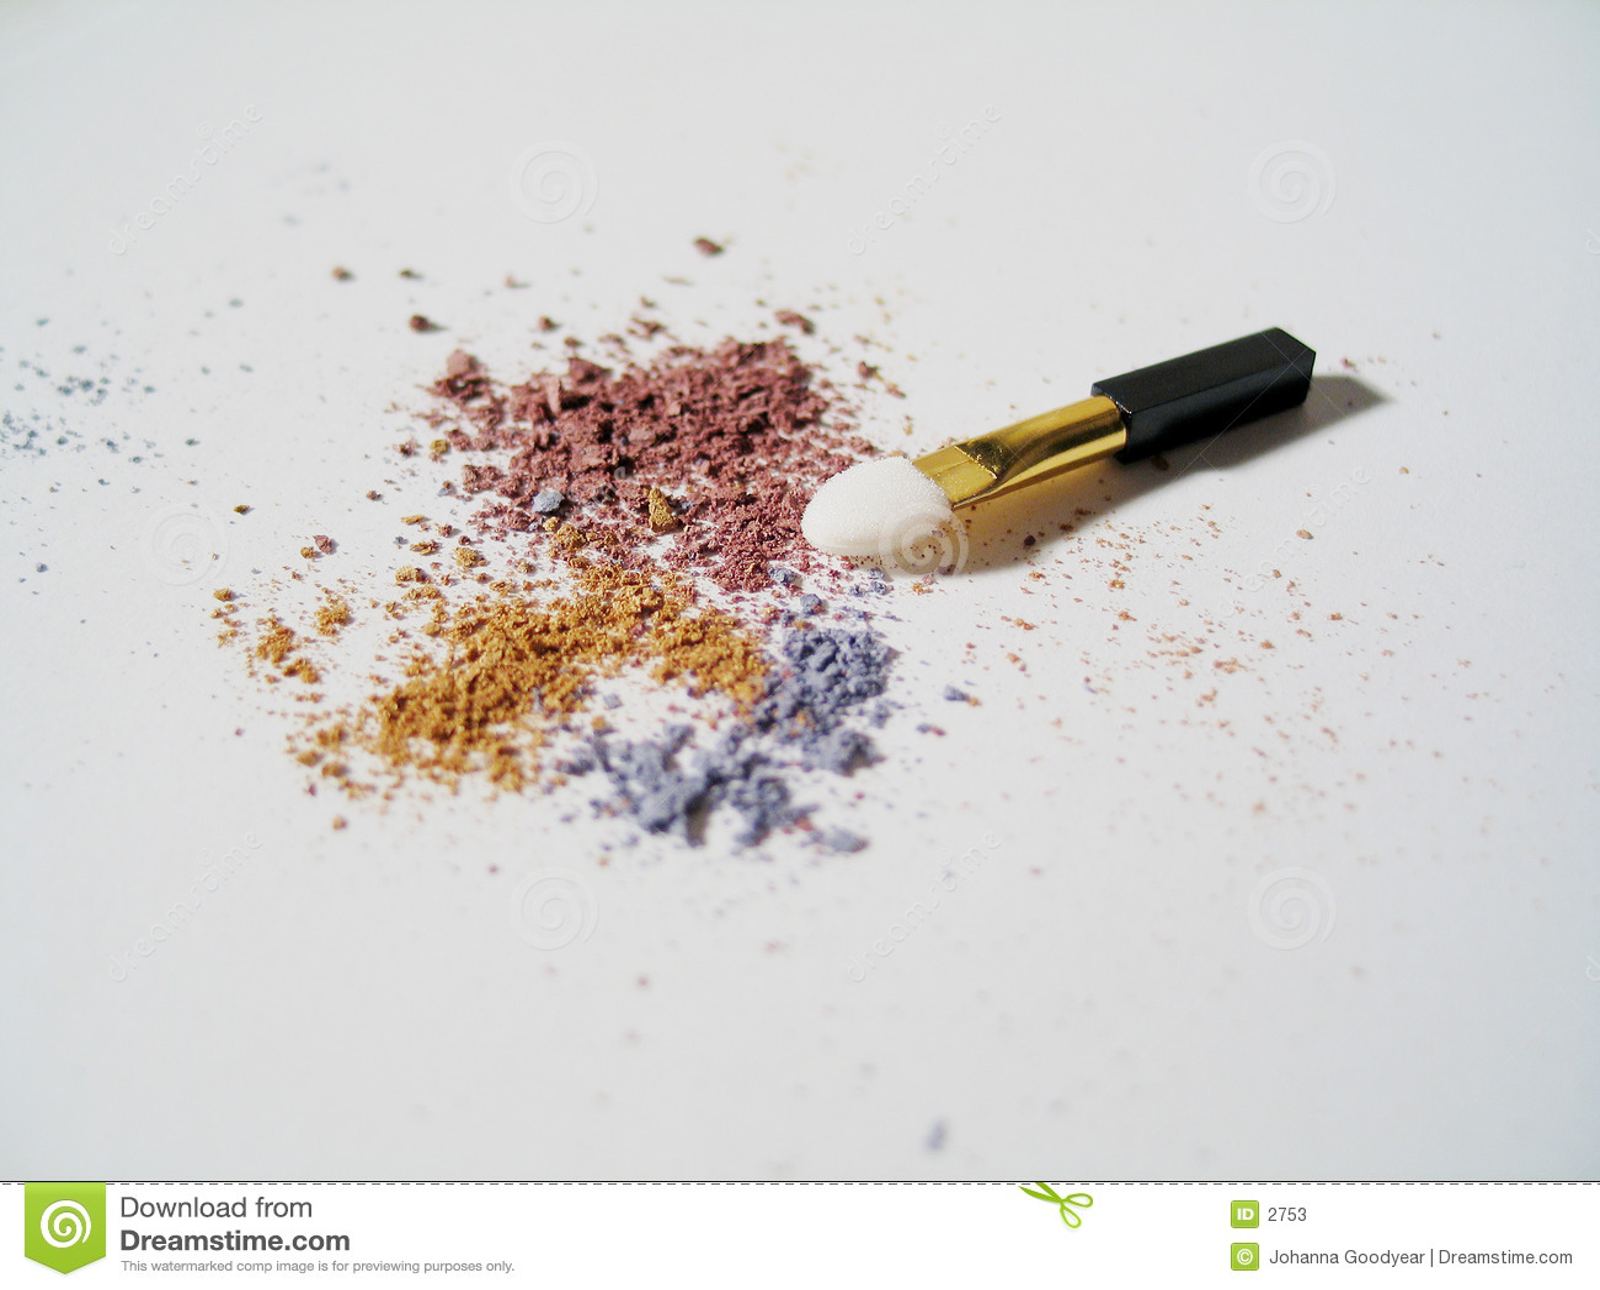 Makeup with Brush